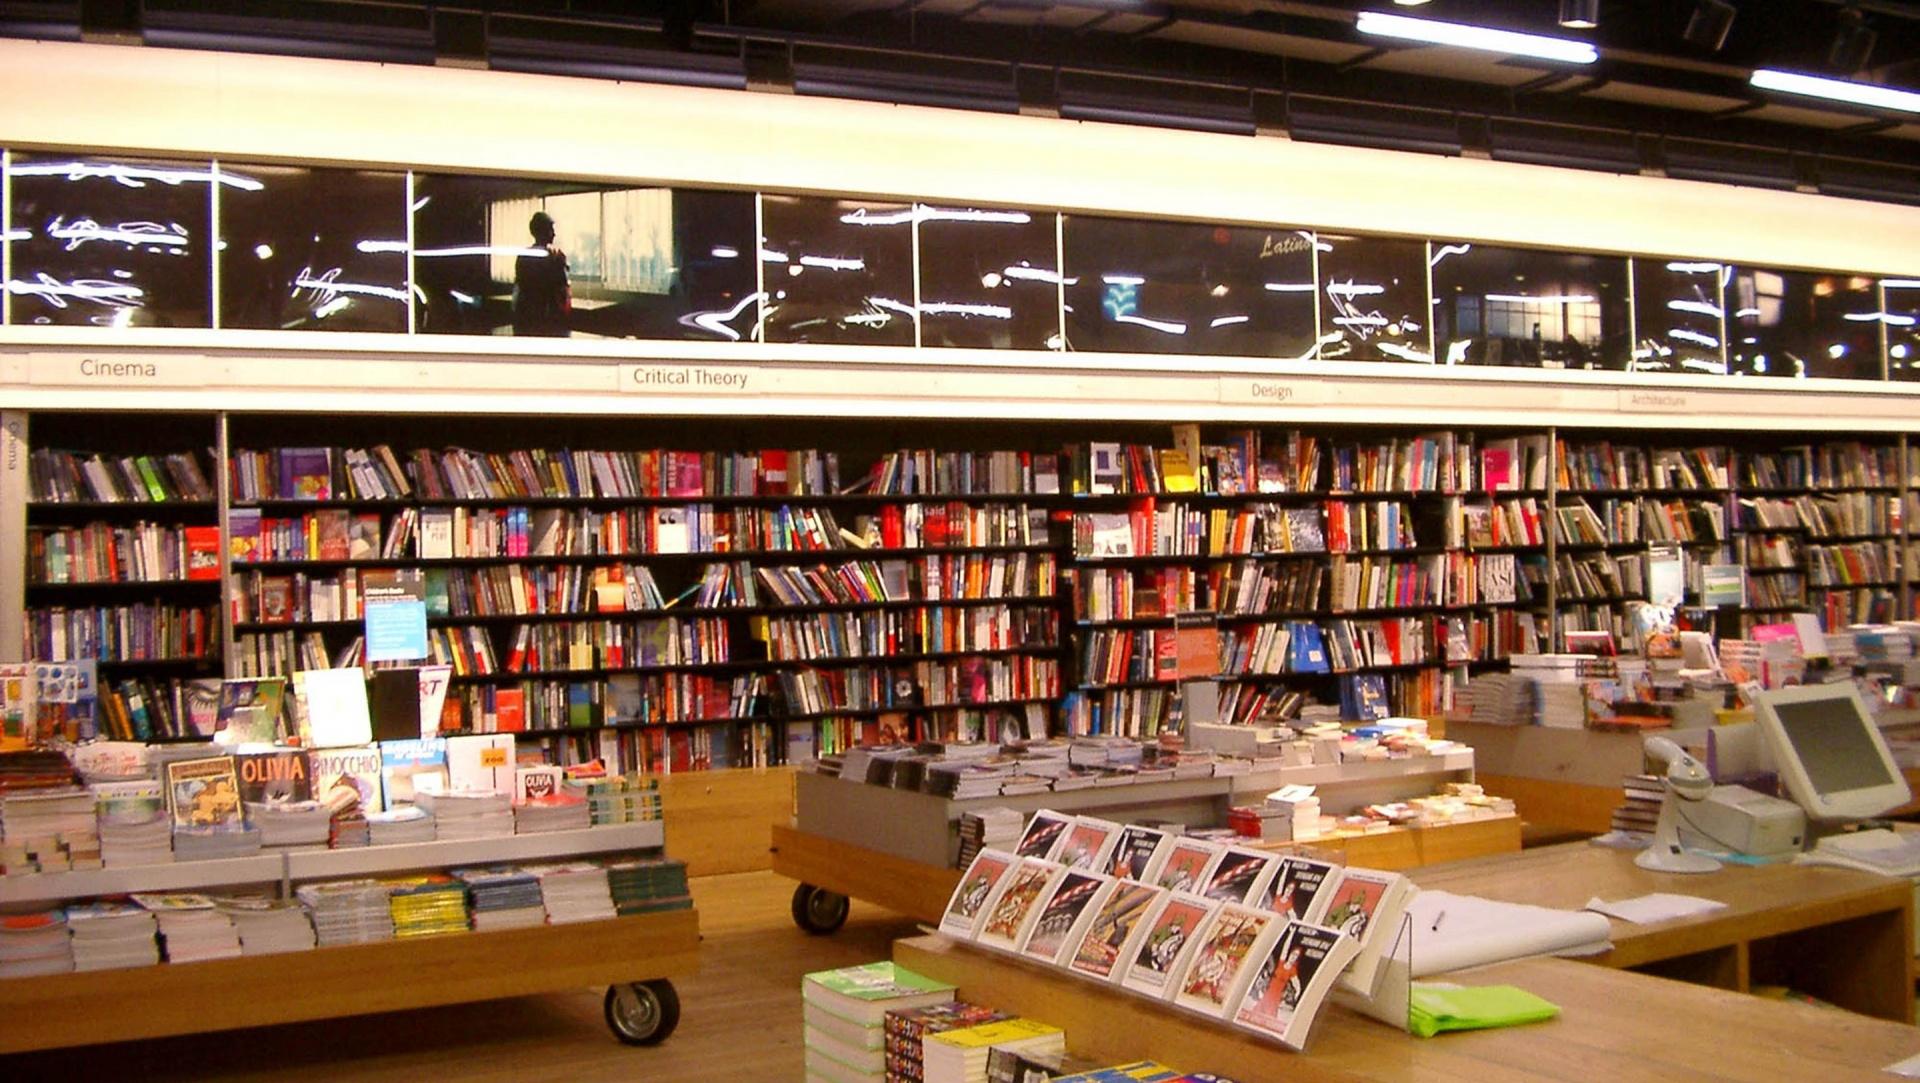 Tate Modern Bookshop London Uk Selected Projects